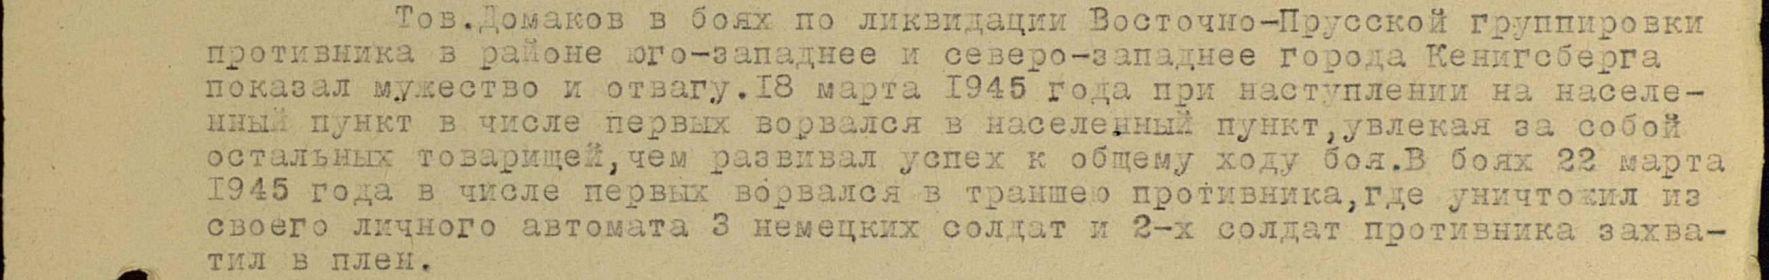 other-soldiers-files/krasnaya_zvezda_2._opisanie_podviga.jpg